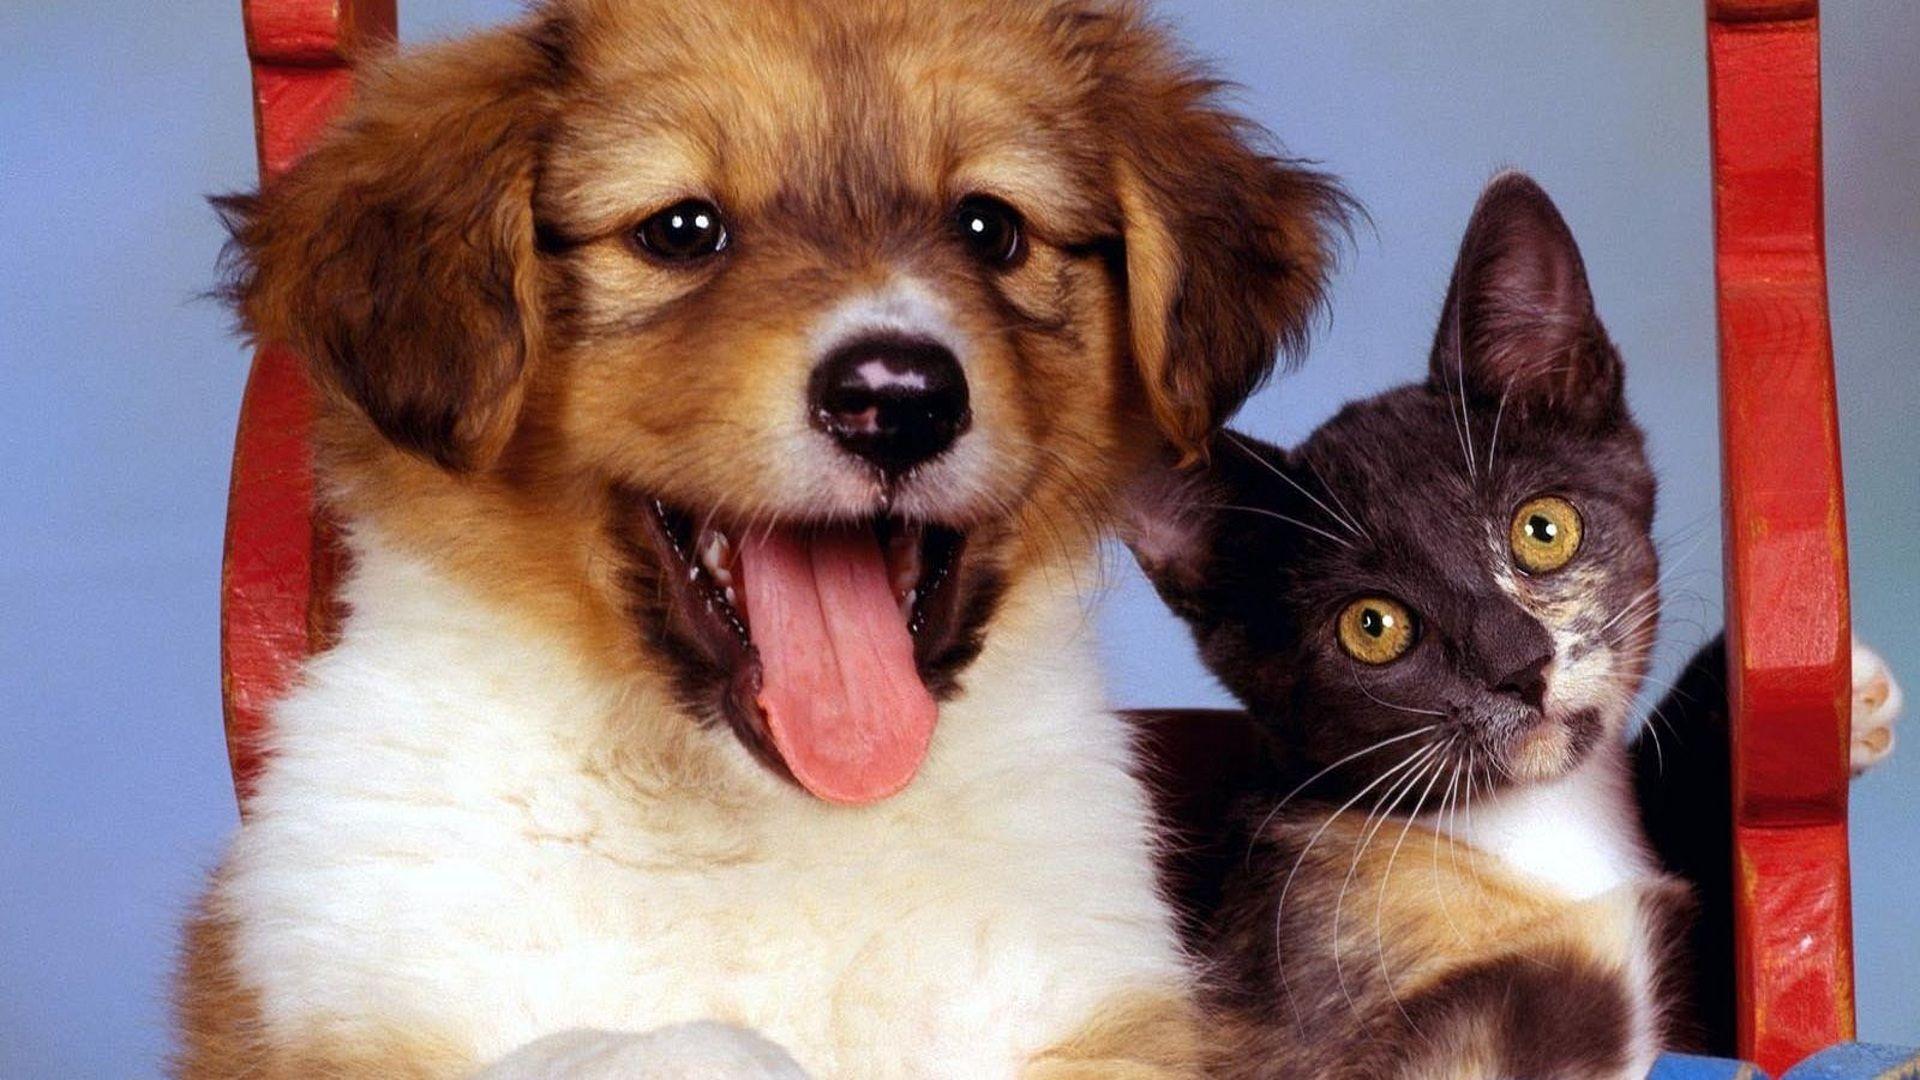 Puppy And Kitten background wallpaper